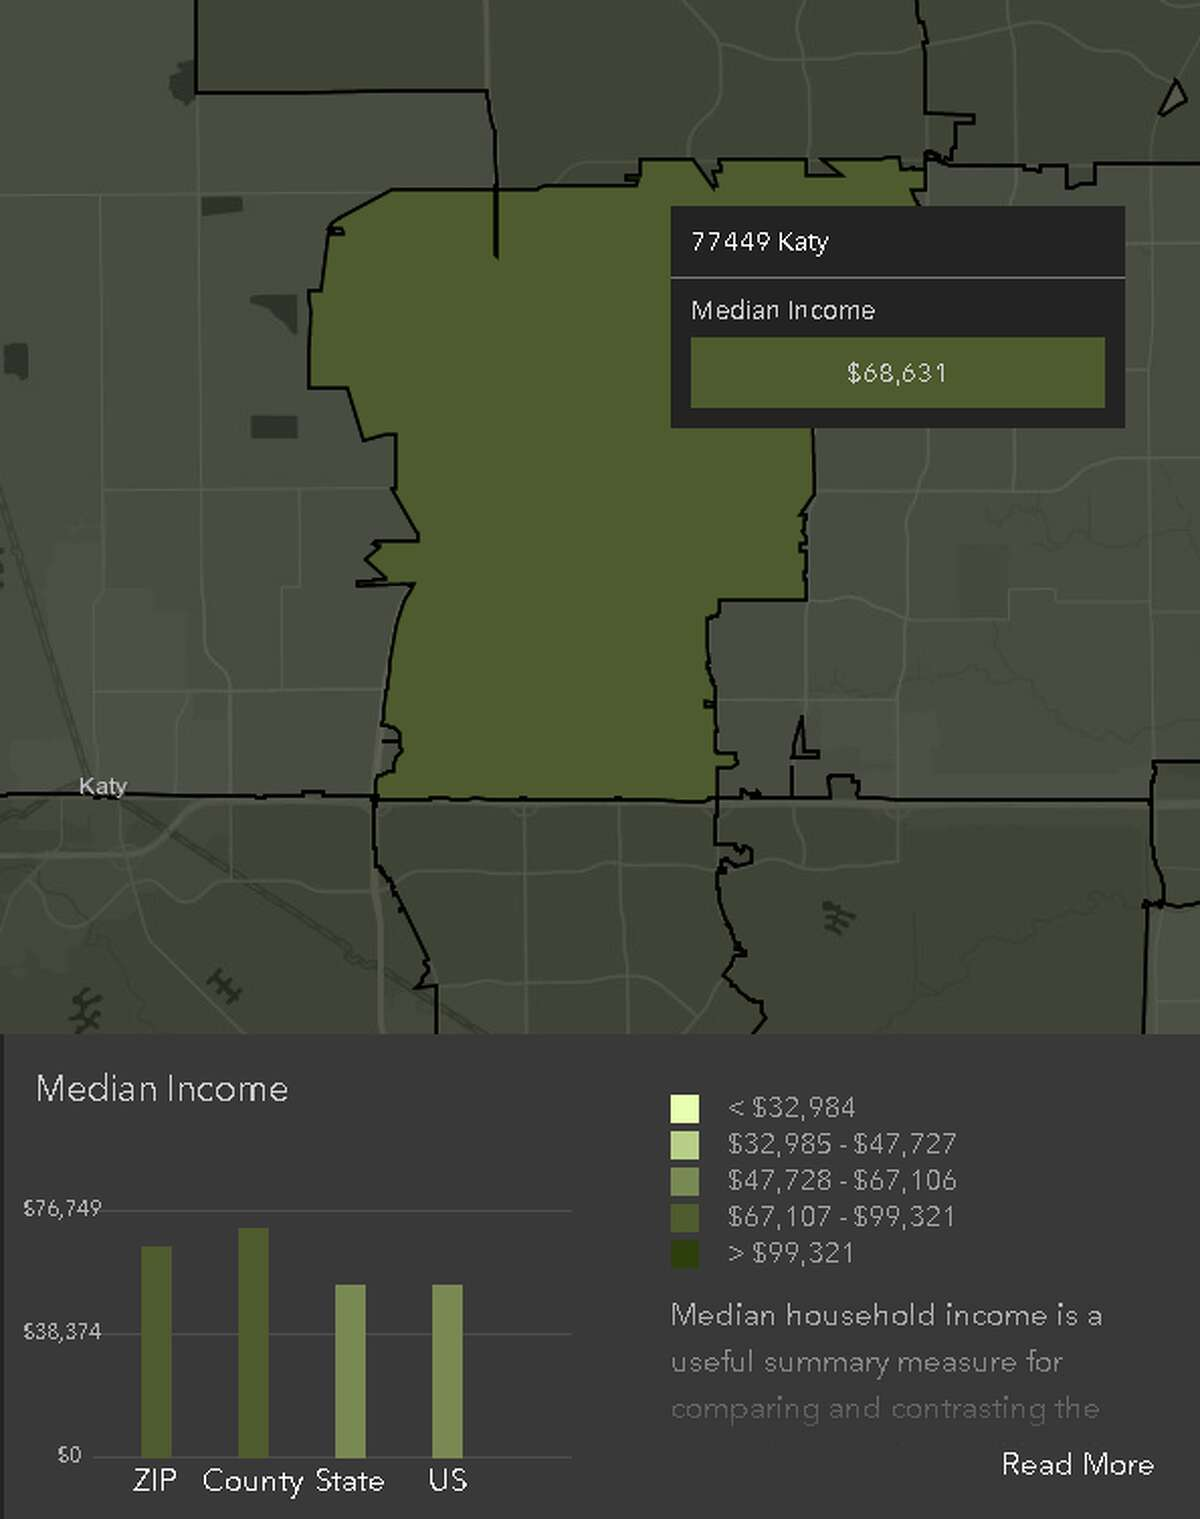 Katy, 77449Median income: $68,631